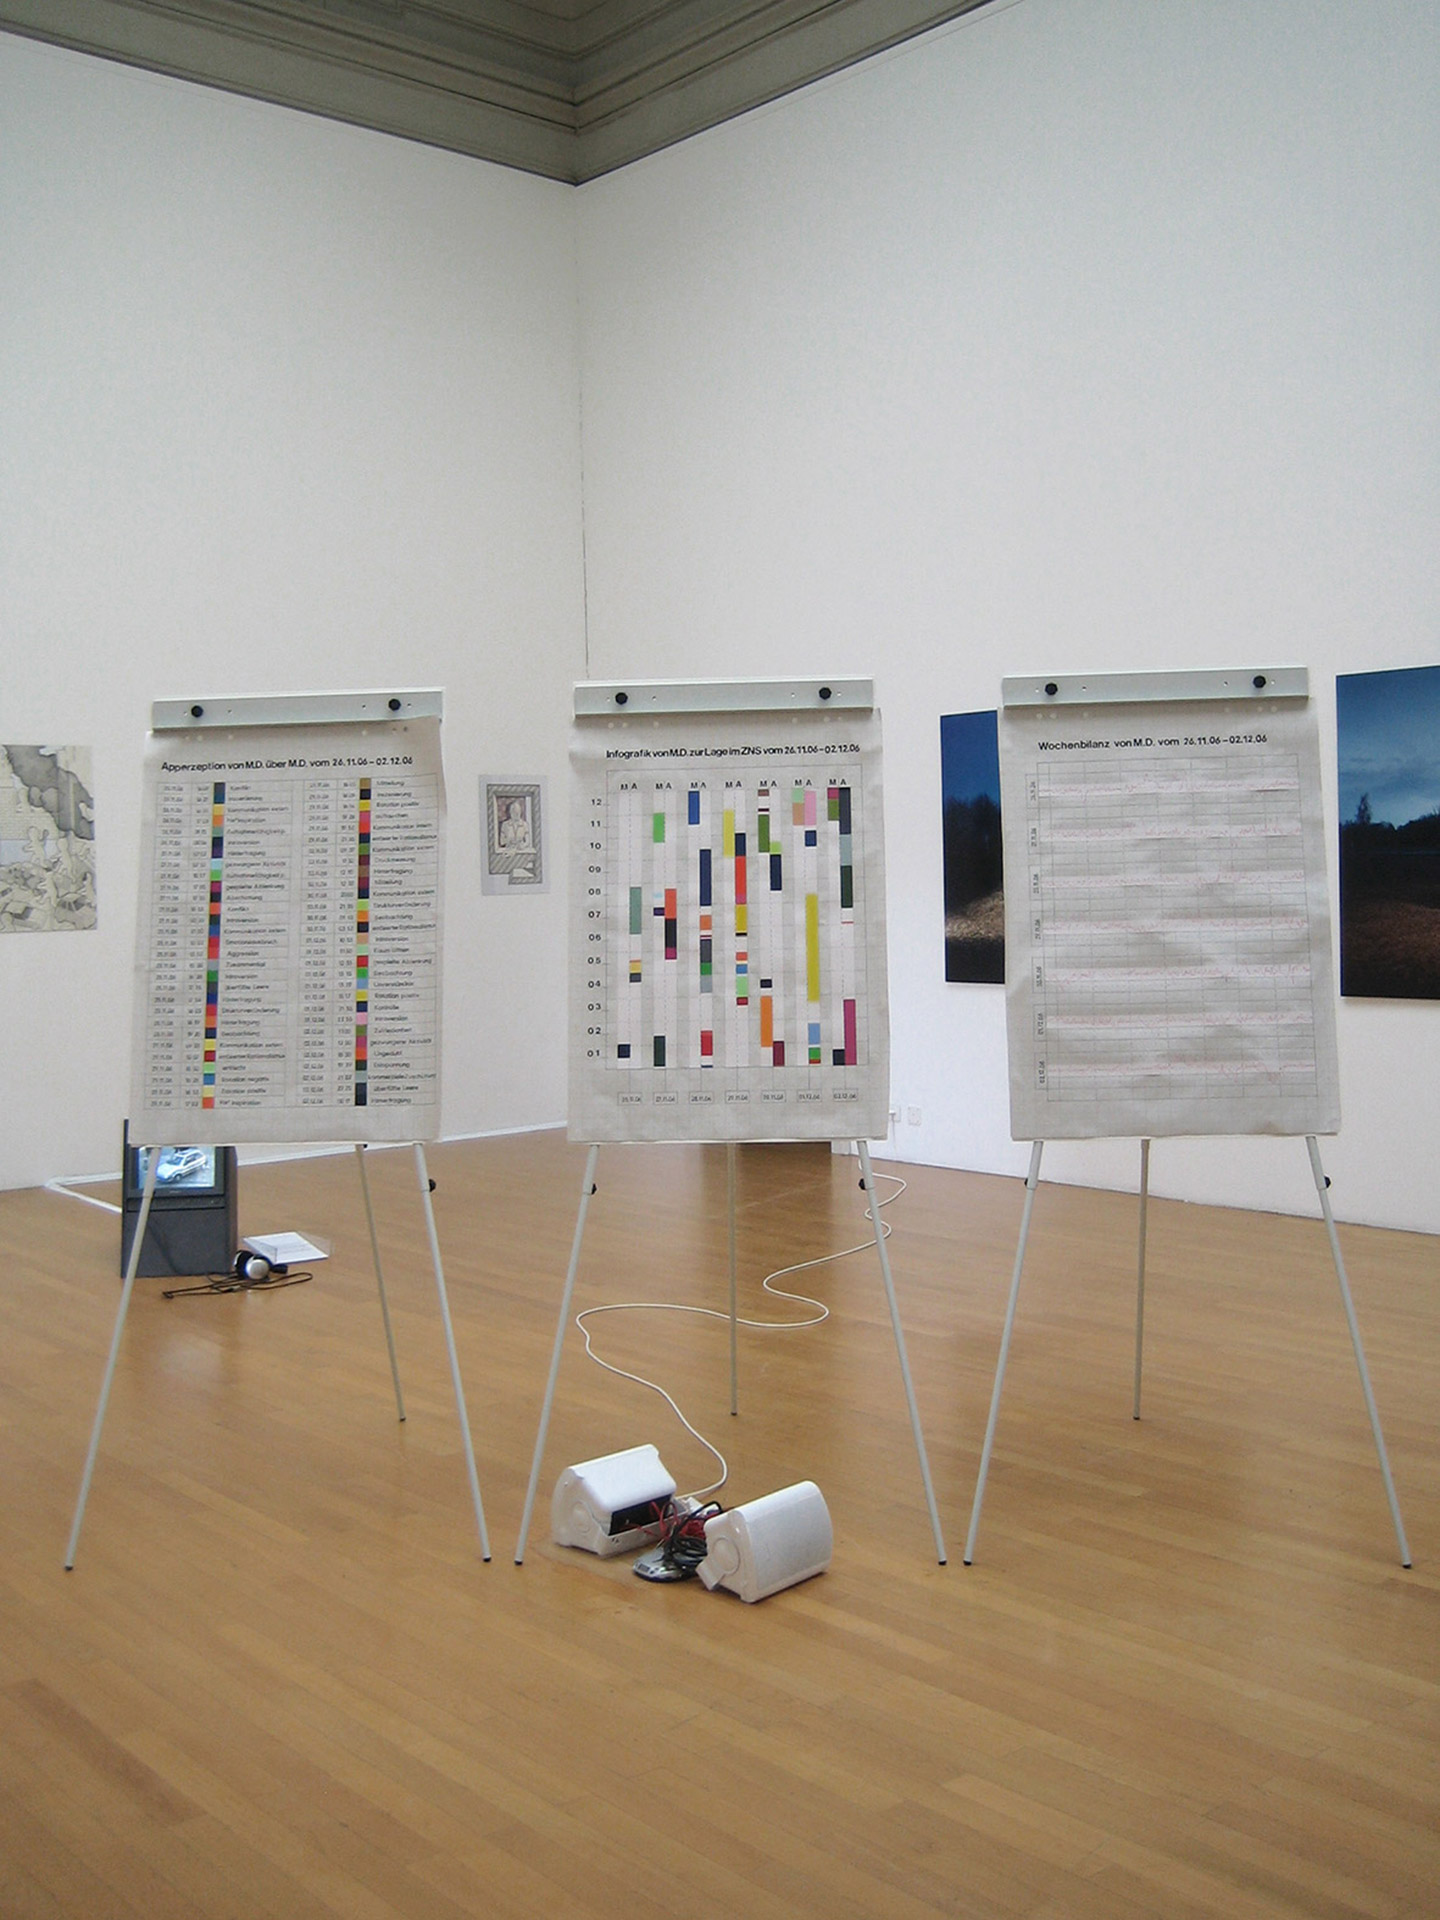 Winterthur-sucht-den-Superstar-Kunsthalle-Winterthur-2007-3.jpg